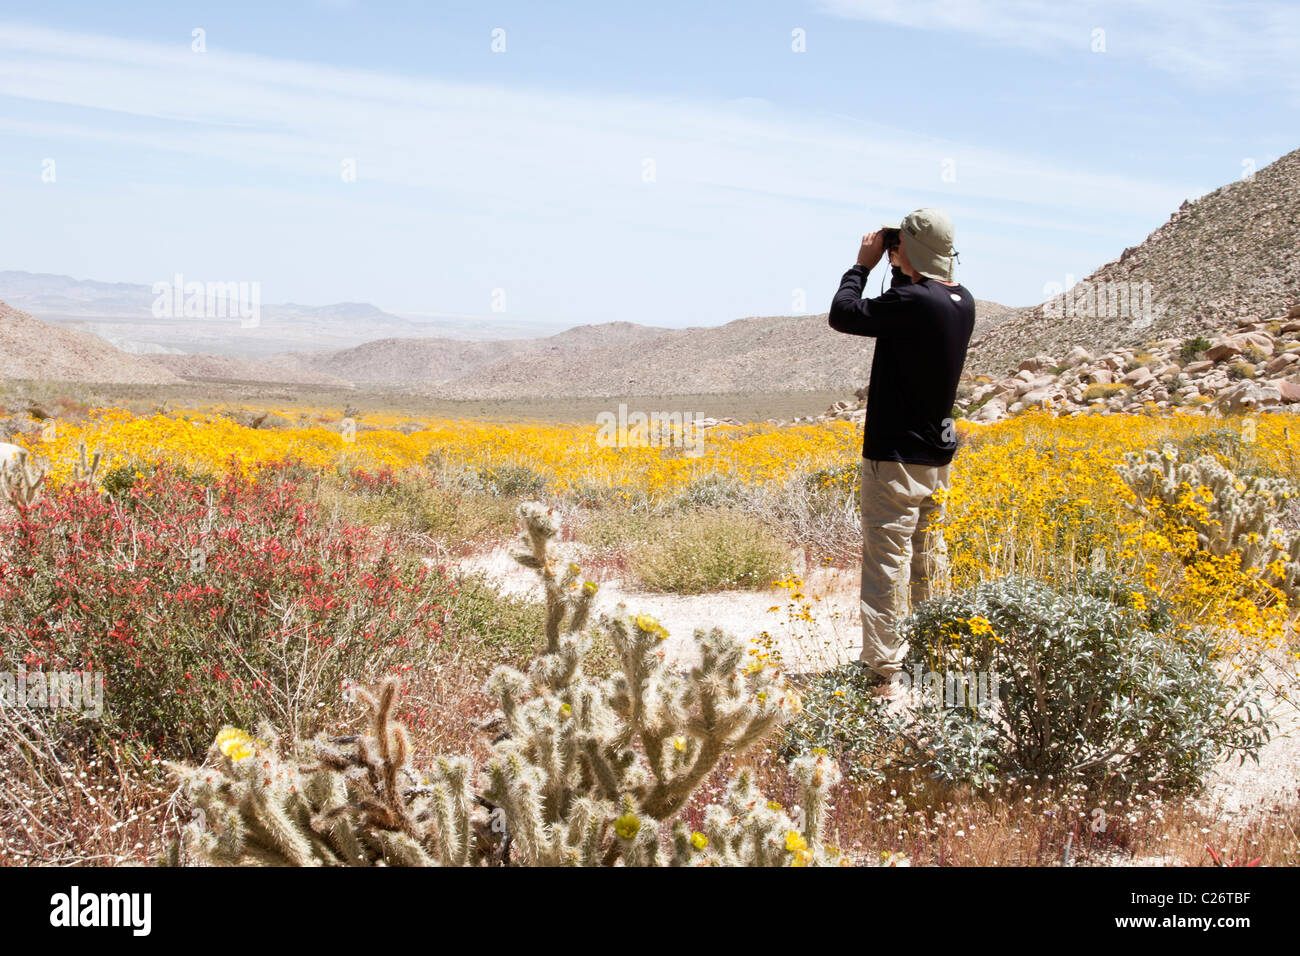 Birdwatcher at Anza Borrego Desert State Park - Stock Image